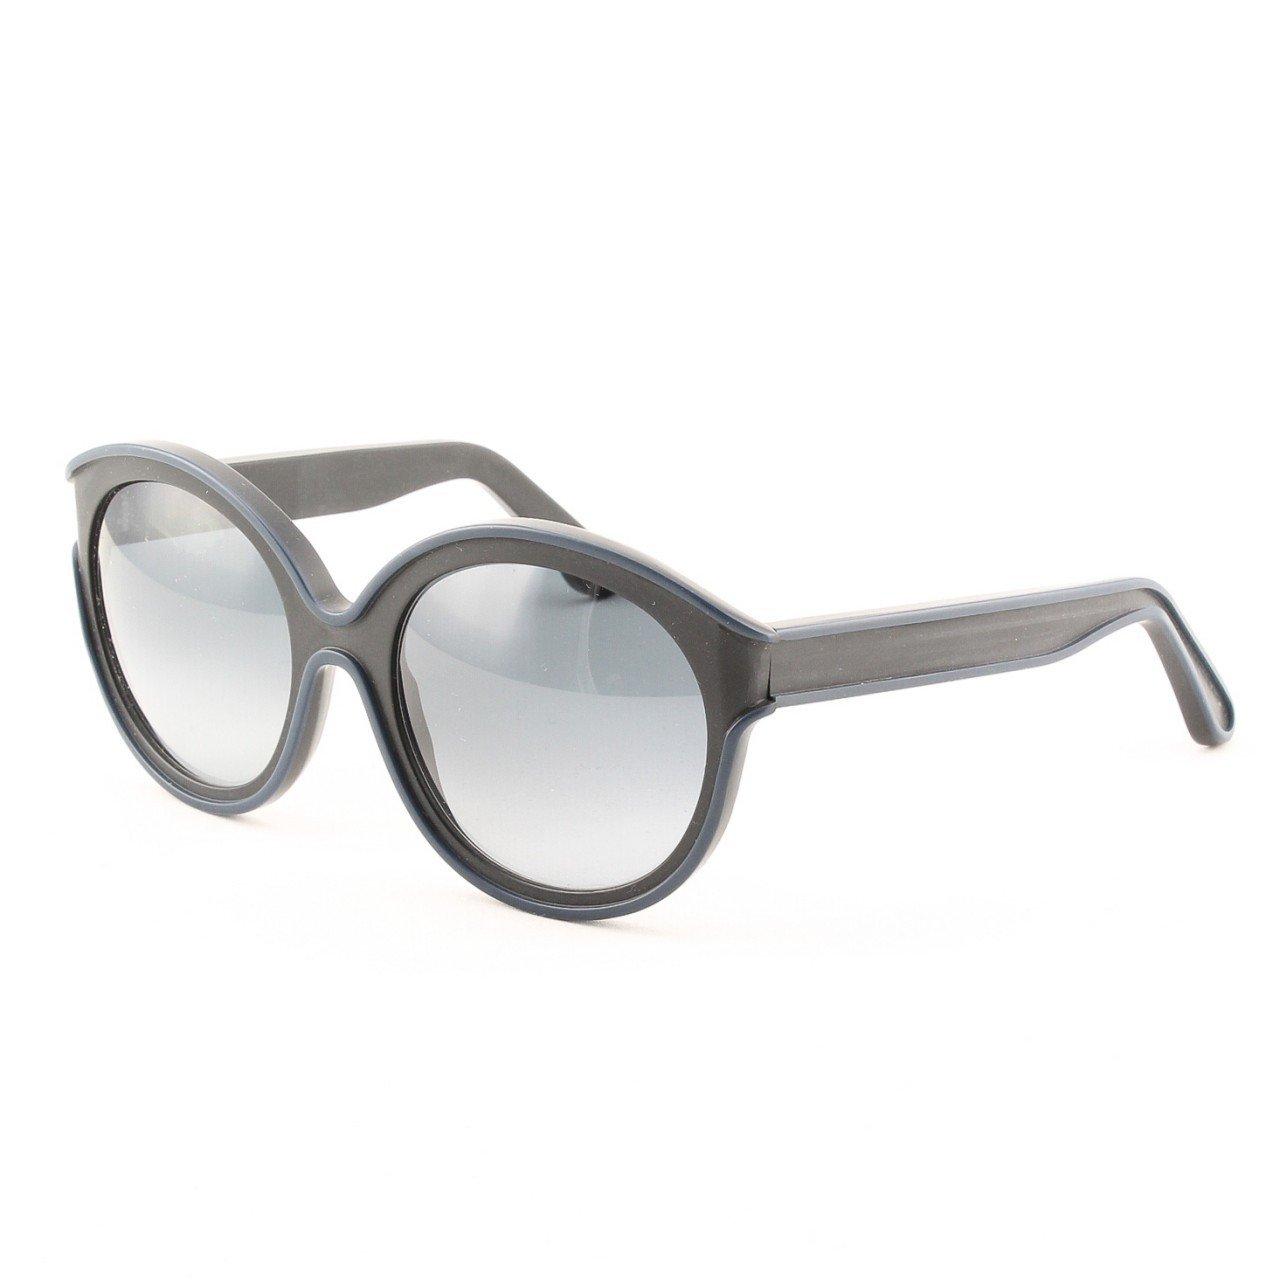 Marni MA195 Sunglasses Col. 04 Opaque Black w/ Navy Trim with Gray Gradient Lenses